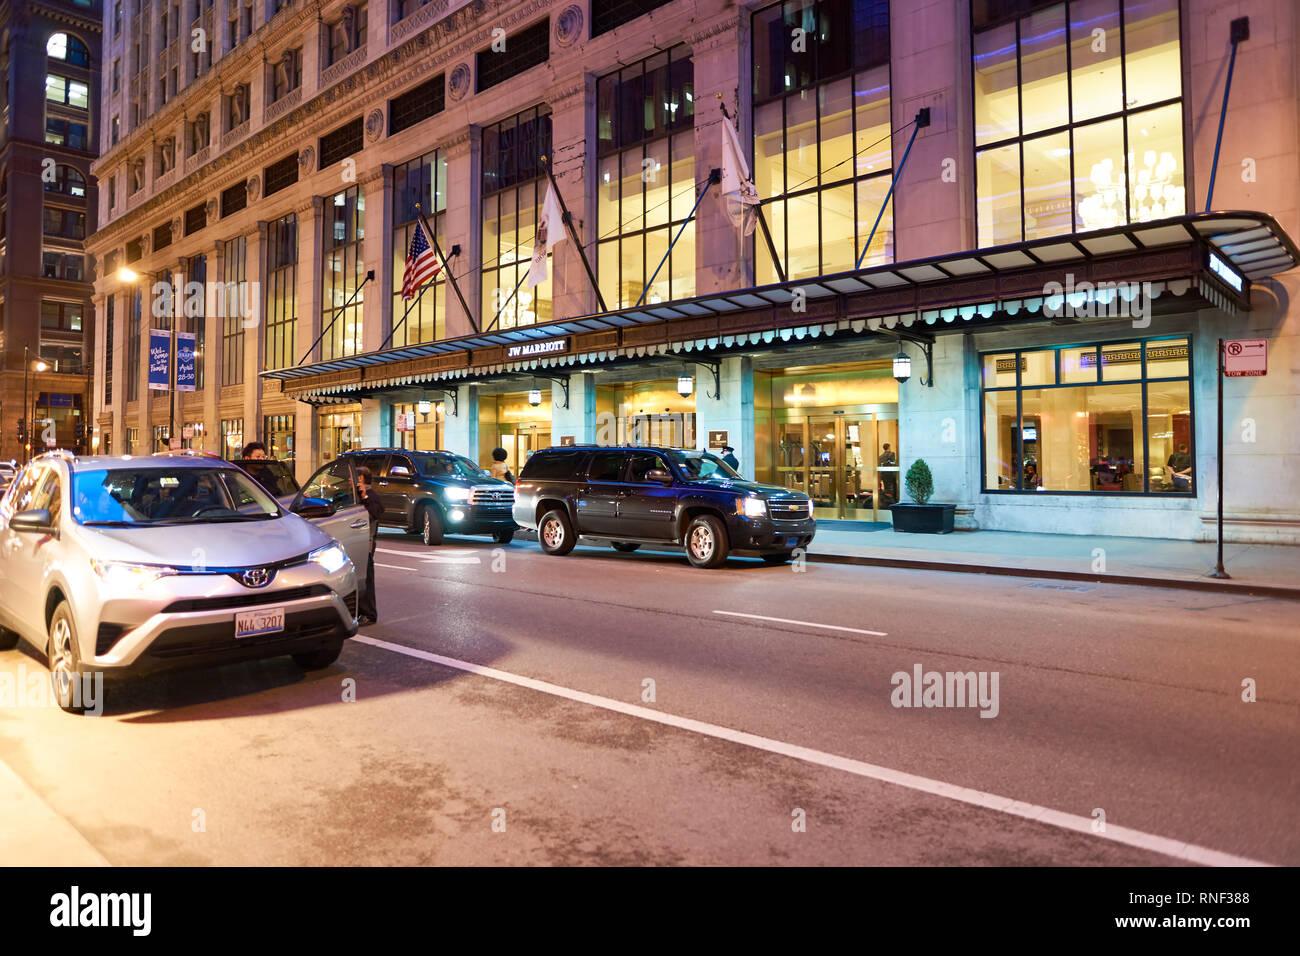 Marriott Hotels And Resorts Stock Photos & Marriott Hotels